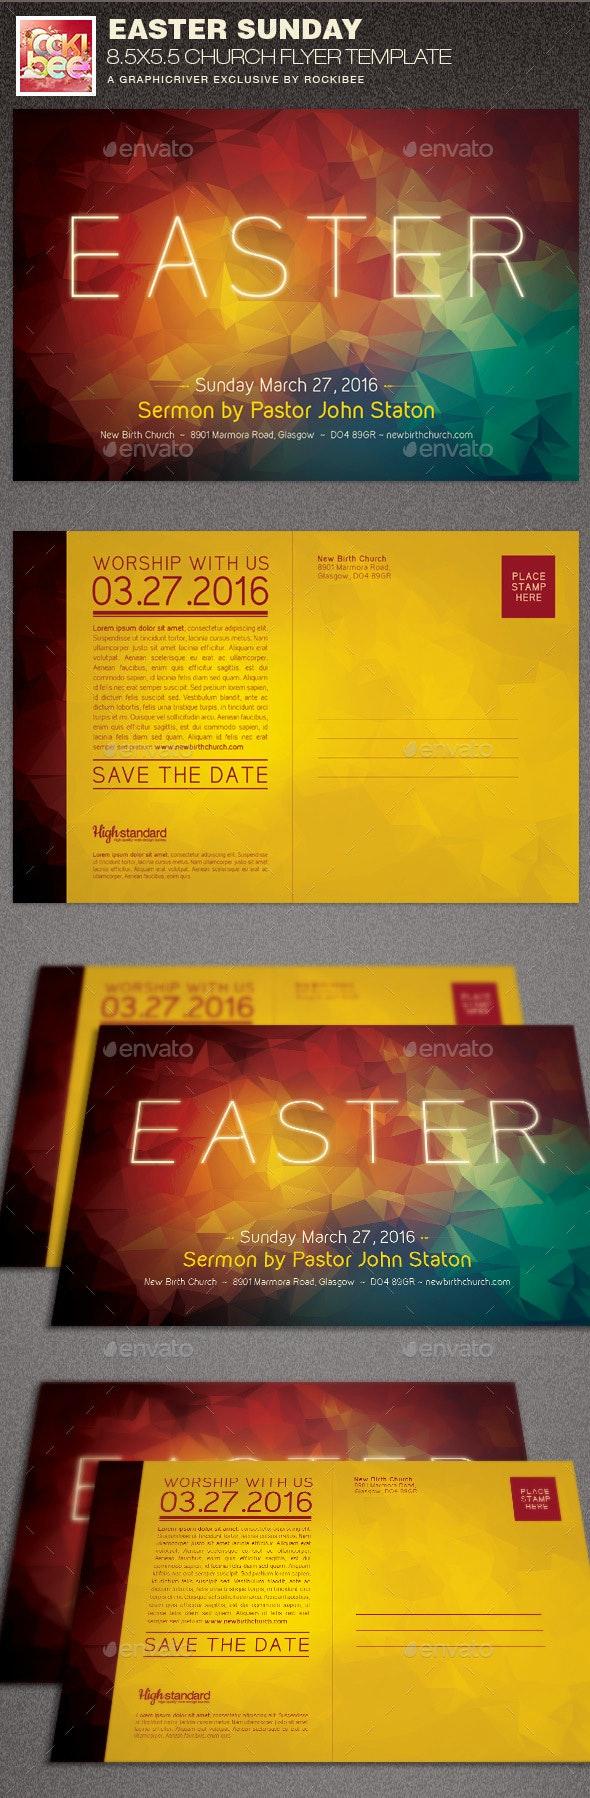 Easter Sunday Church Flyer Template - Church Flyers